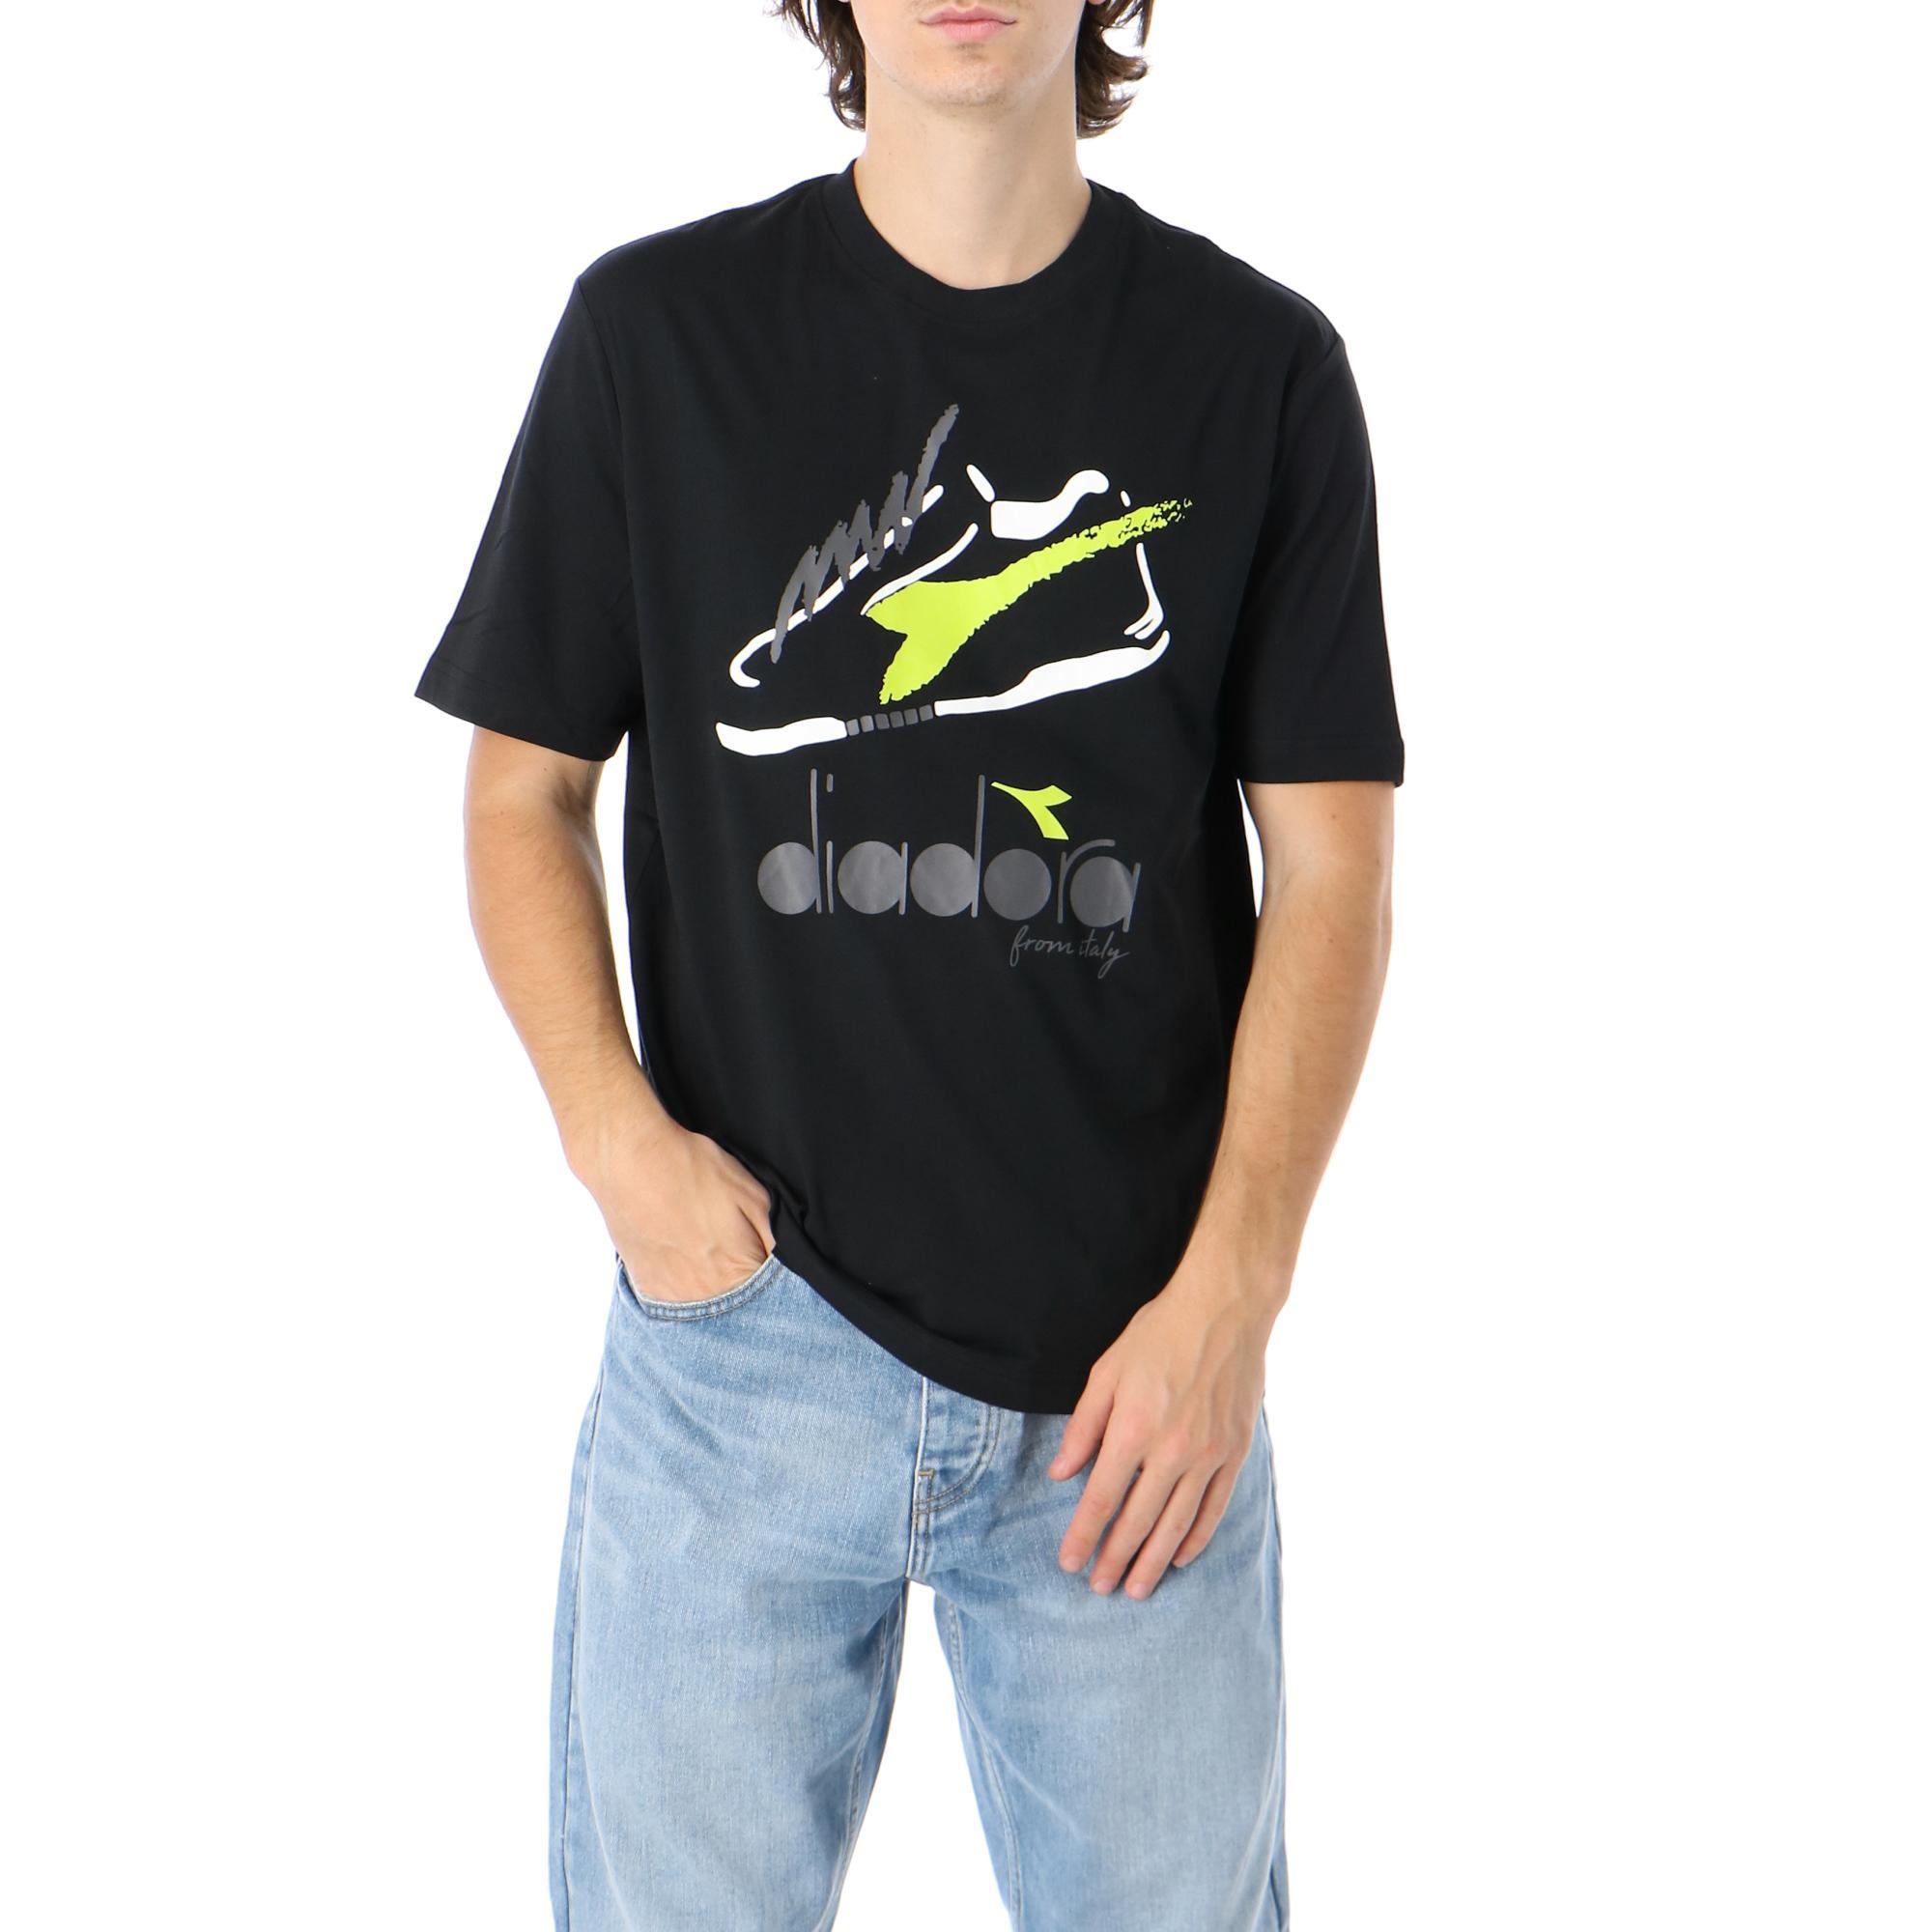 Diadora Ss Tshirt '95 Krk Black